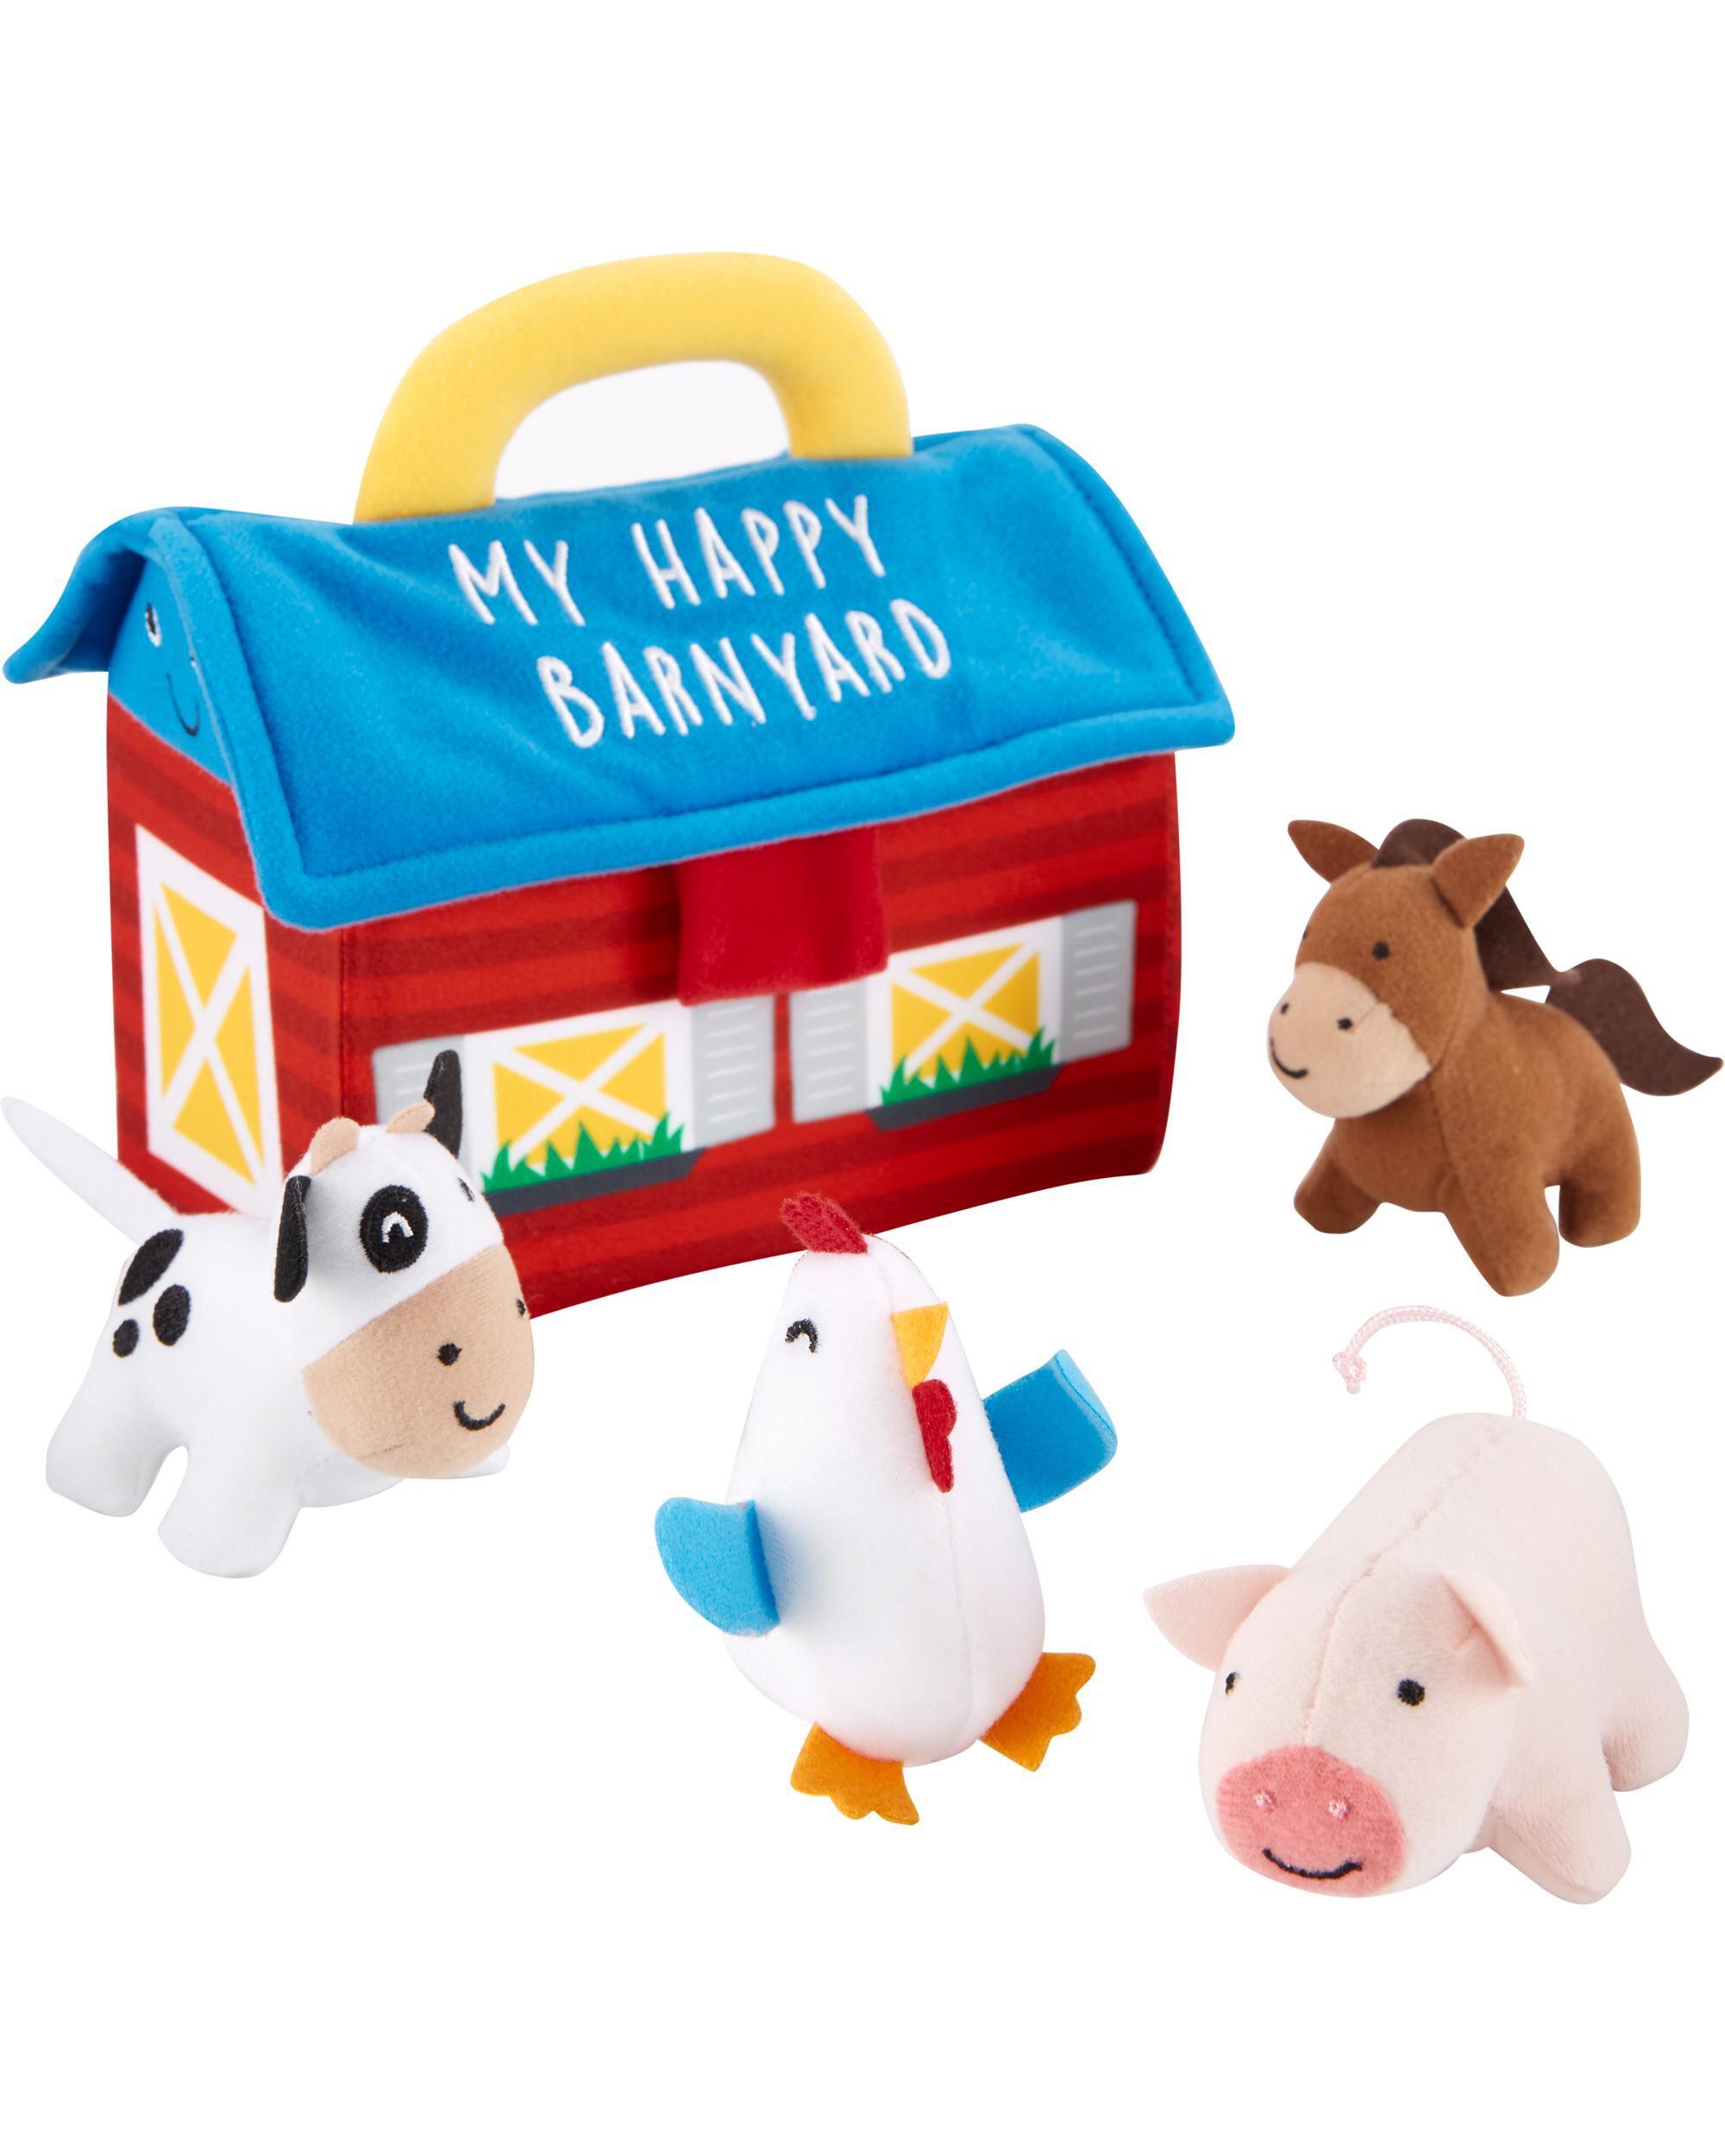 Oshkoshbgosh Plush Barn Activity Set